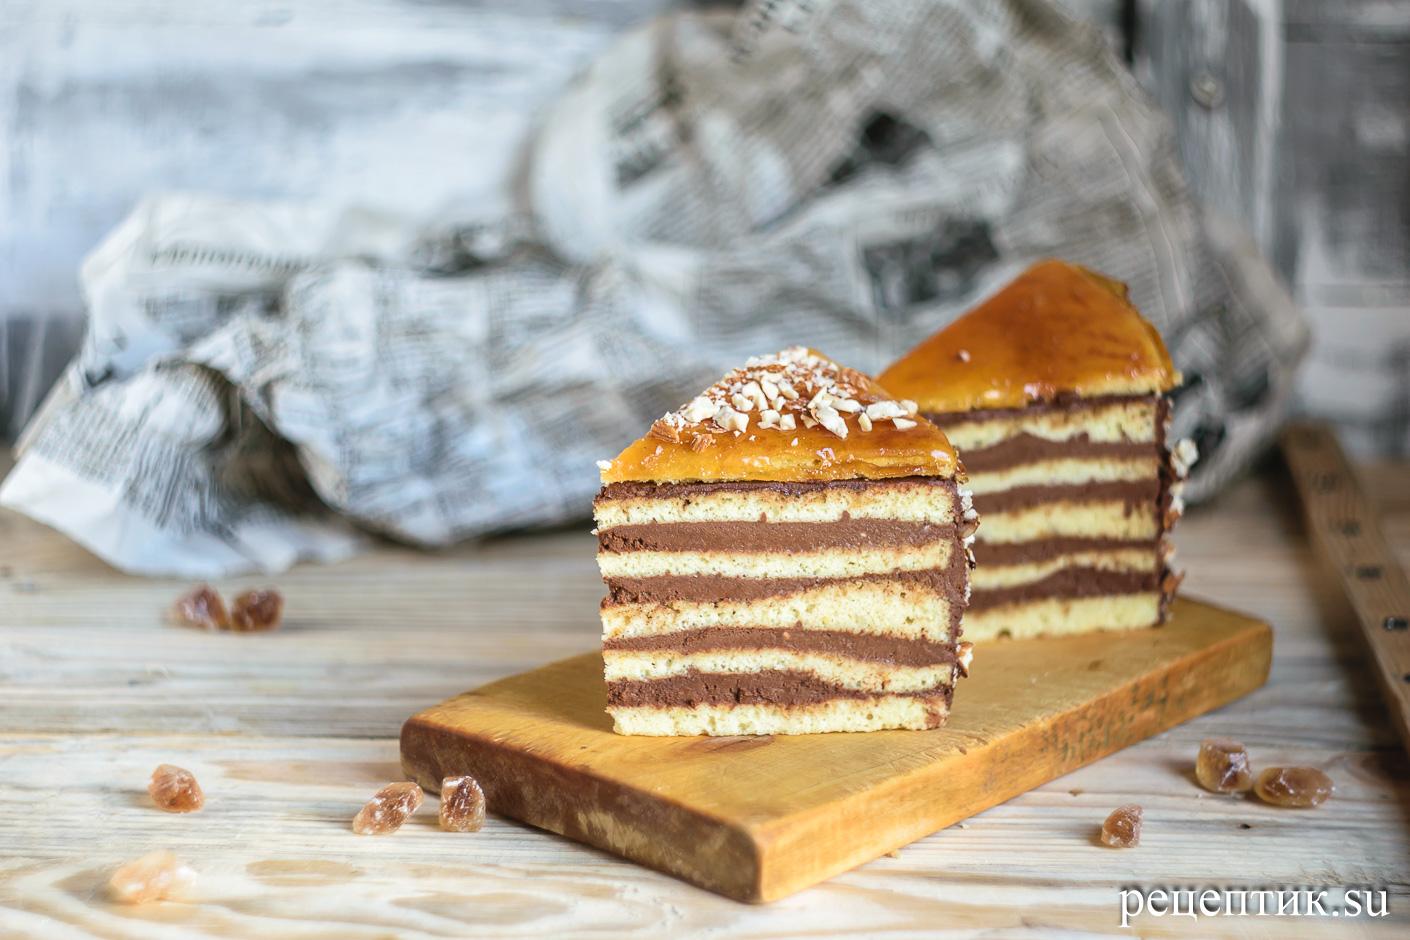 Торт «Добош» - рецепт с фото, шаг 29